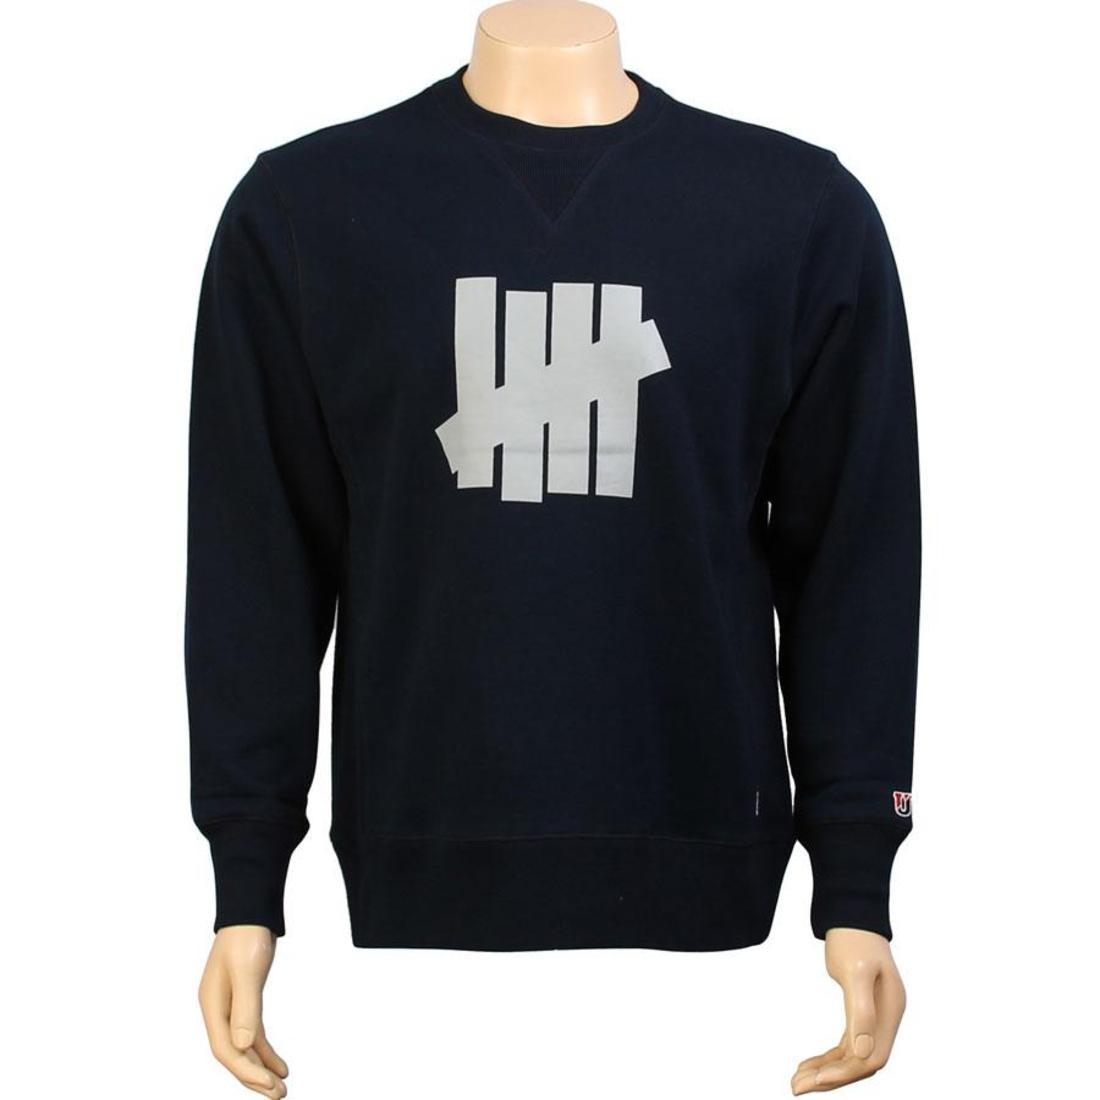 UNDEFEATED メンズファッション トップス Tシャツ カットソー メンズ 【 Corporate Five Crewneck (navy) 】 Navy